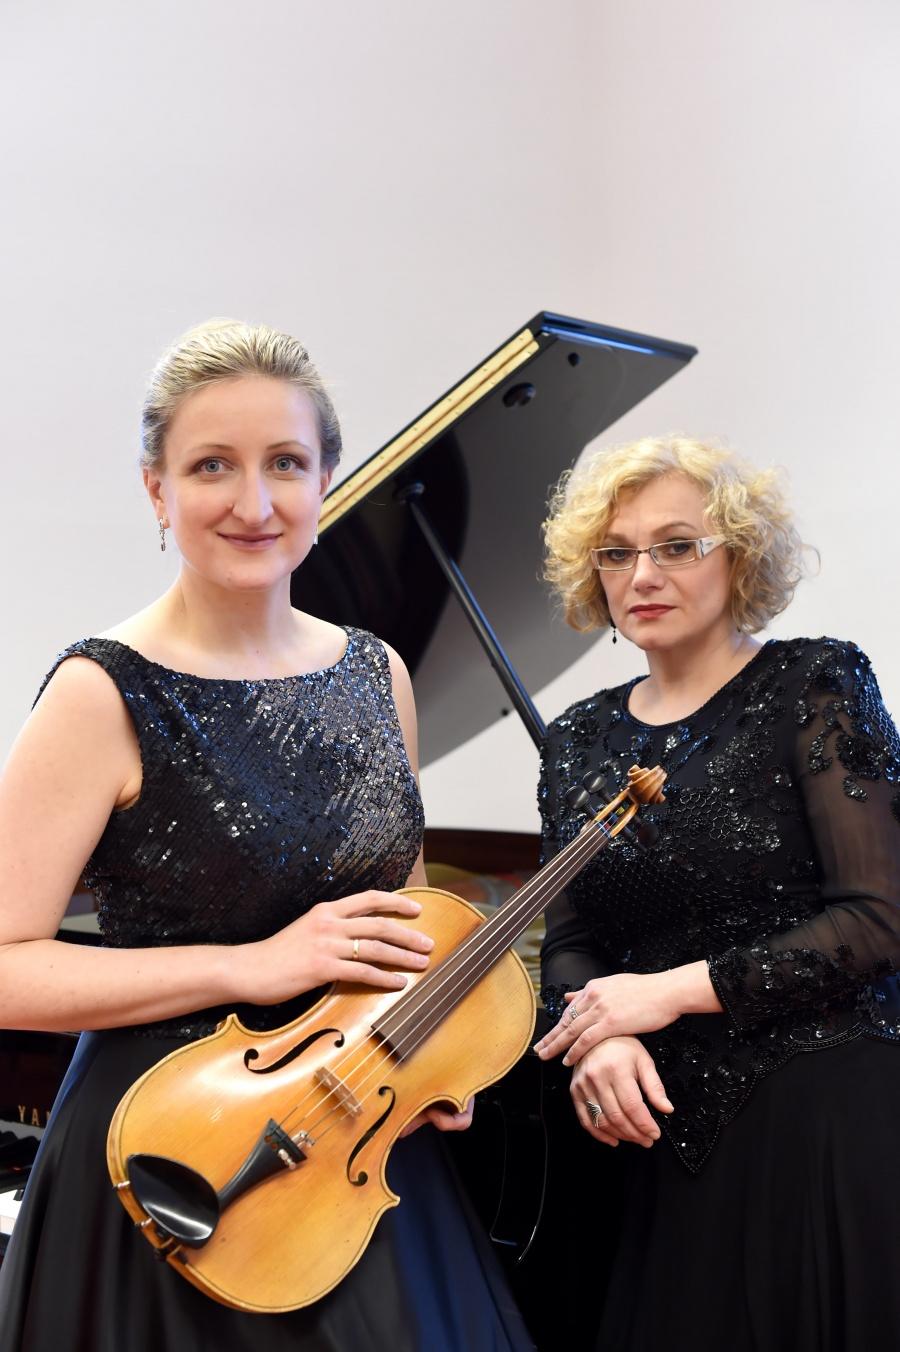 duo-oldenburg-gajda